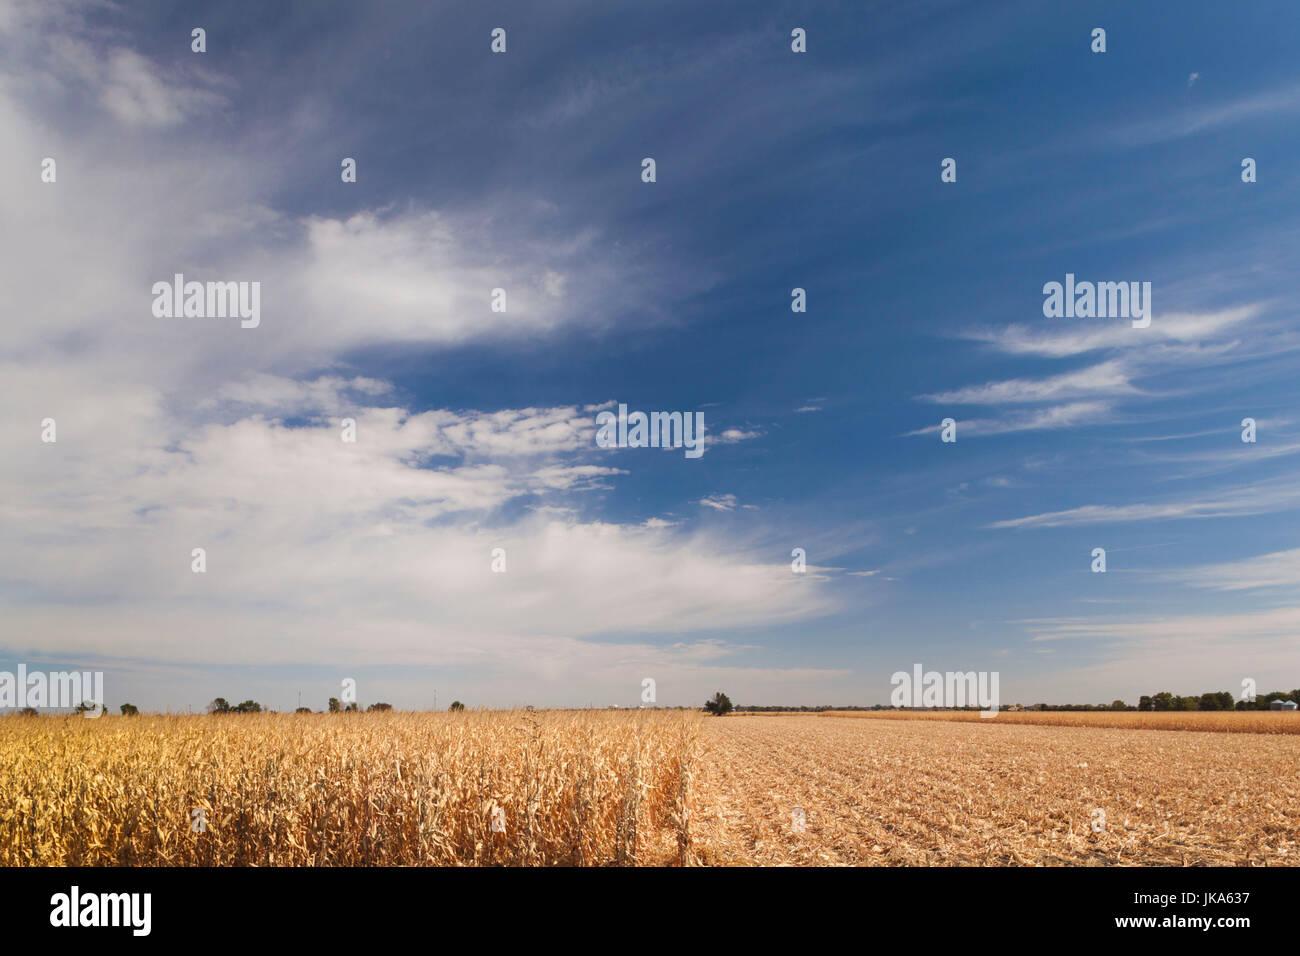 USA, Nebraska, North Platte, wheat field Stock Photo